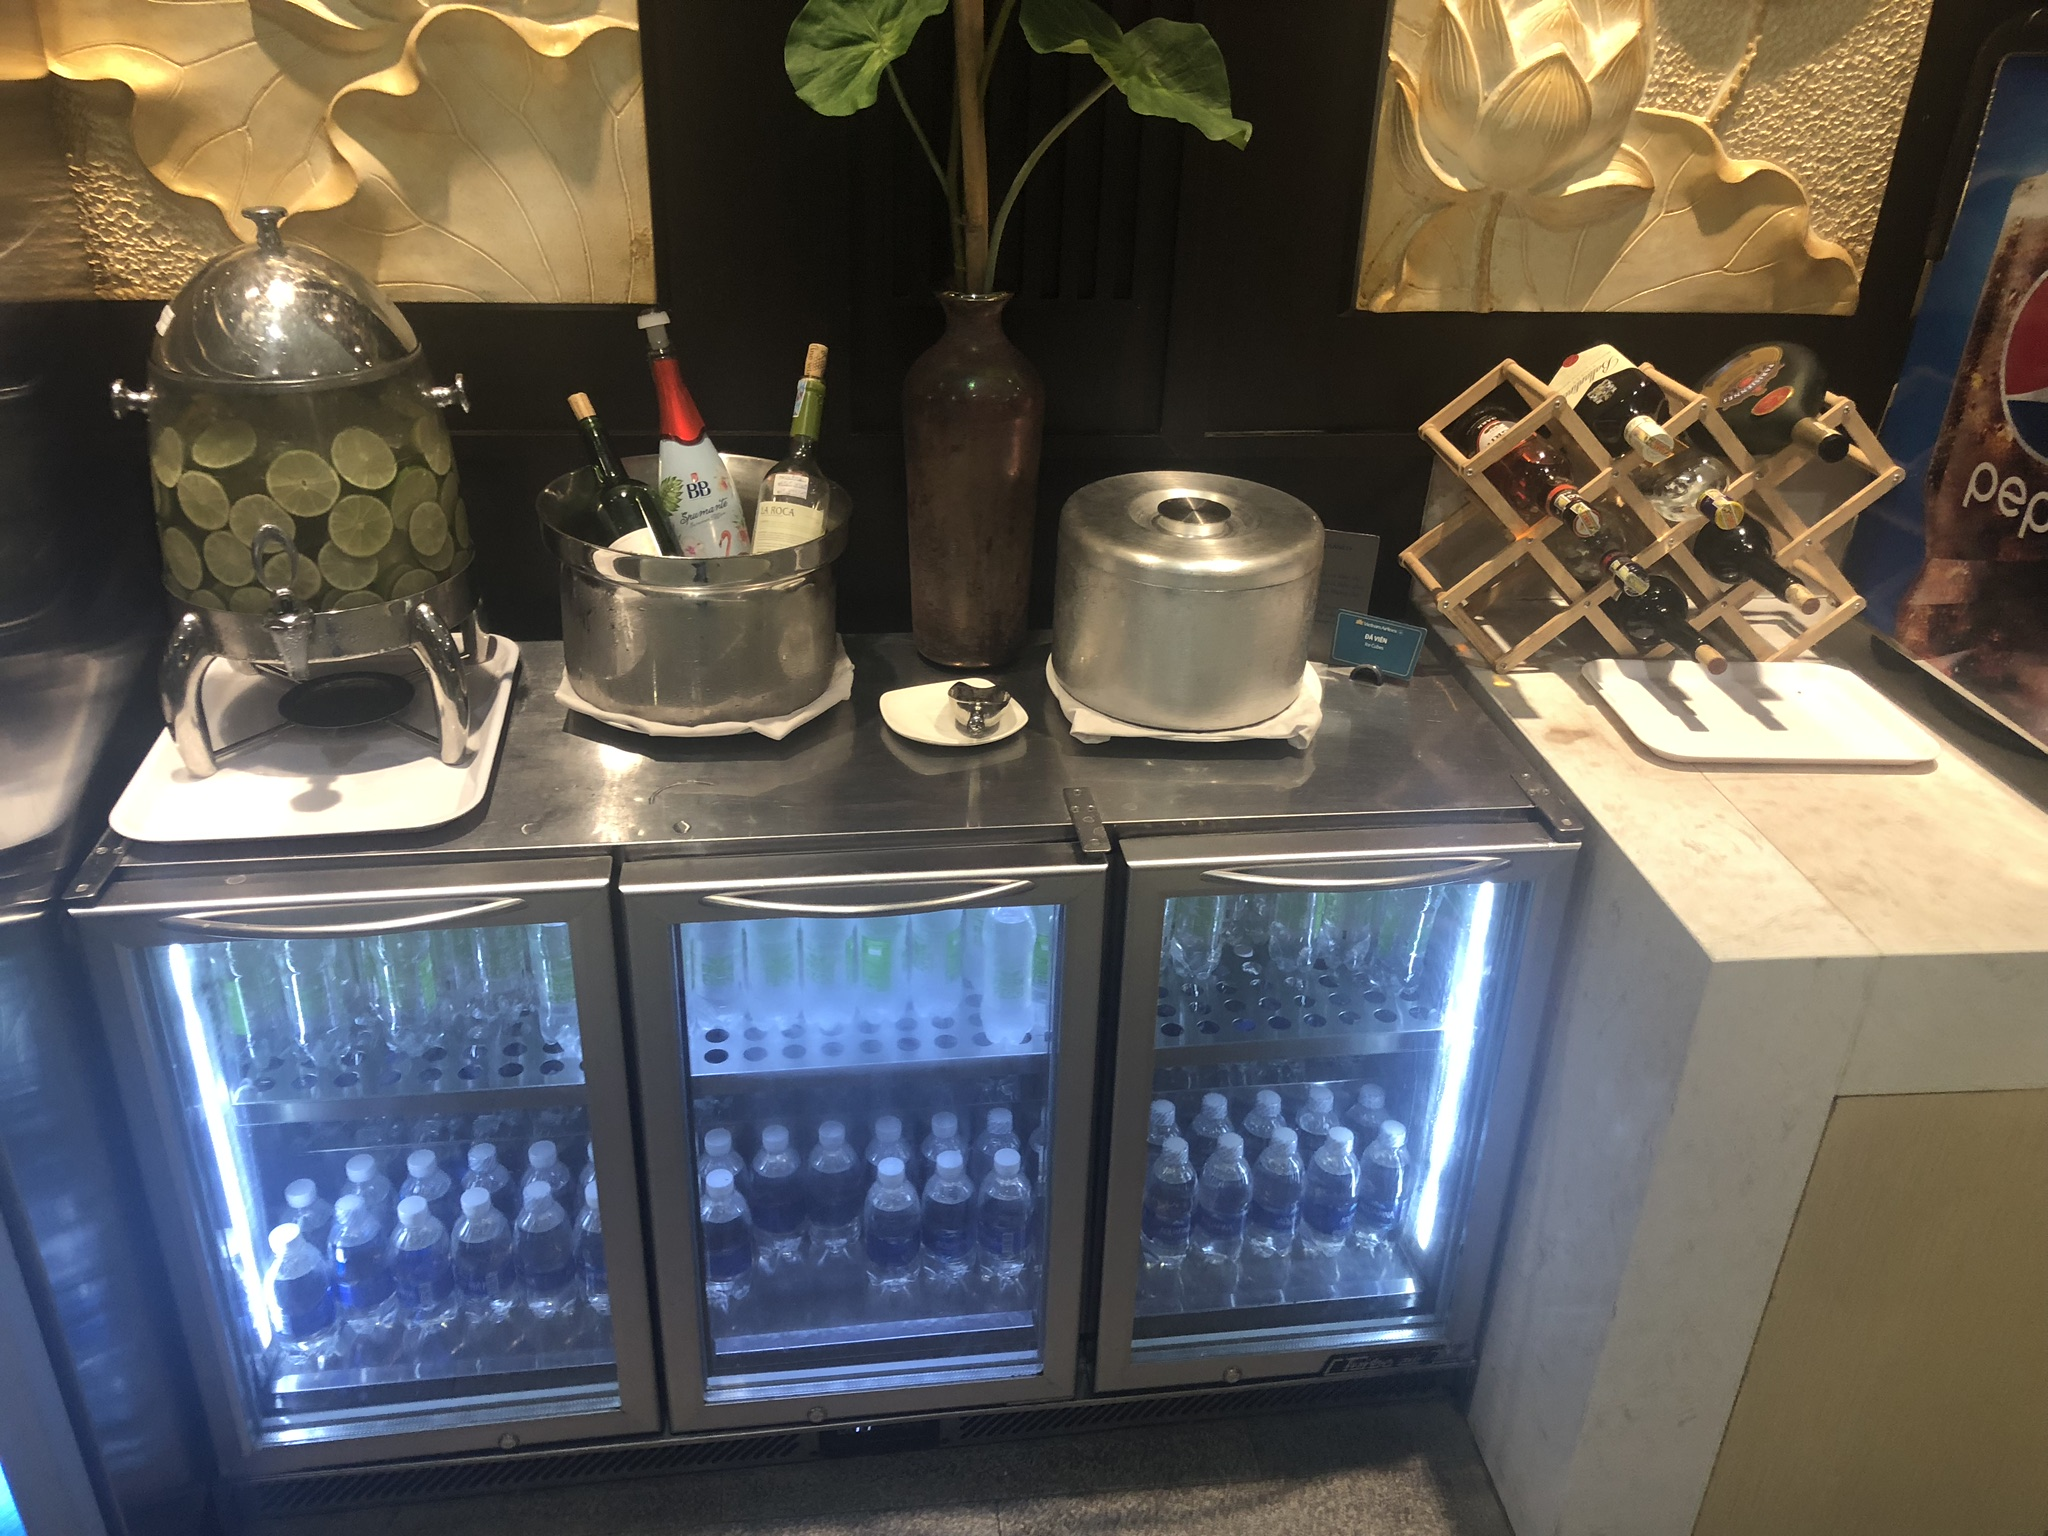 Vietnam Airlines Lotus Lounge drinks